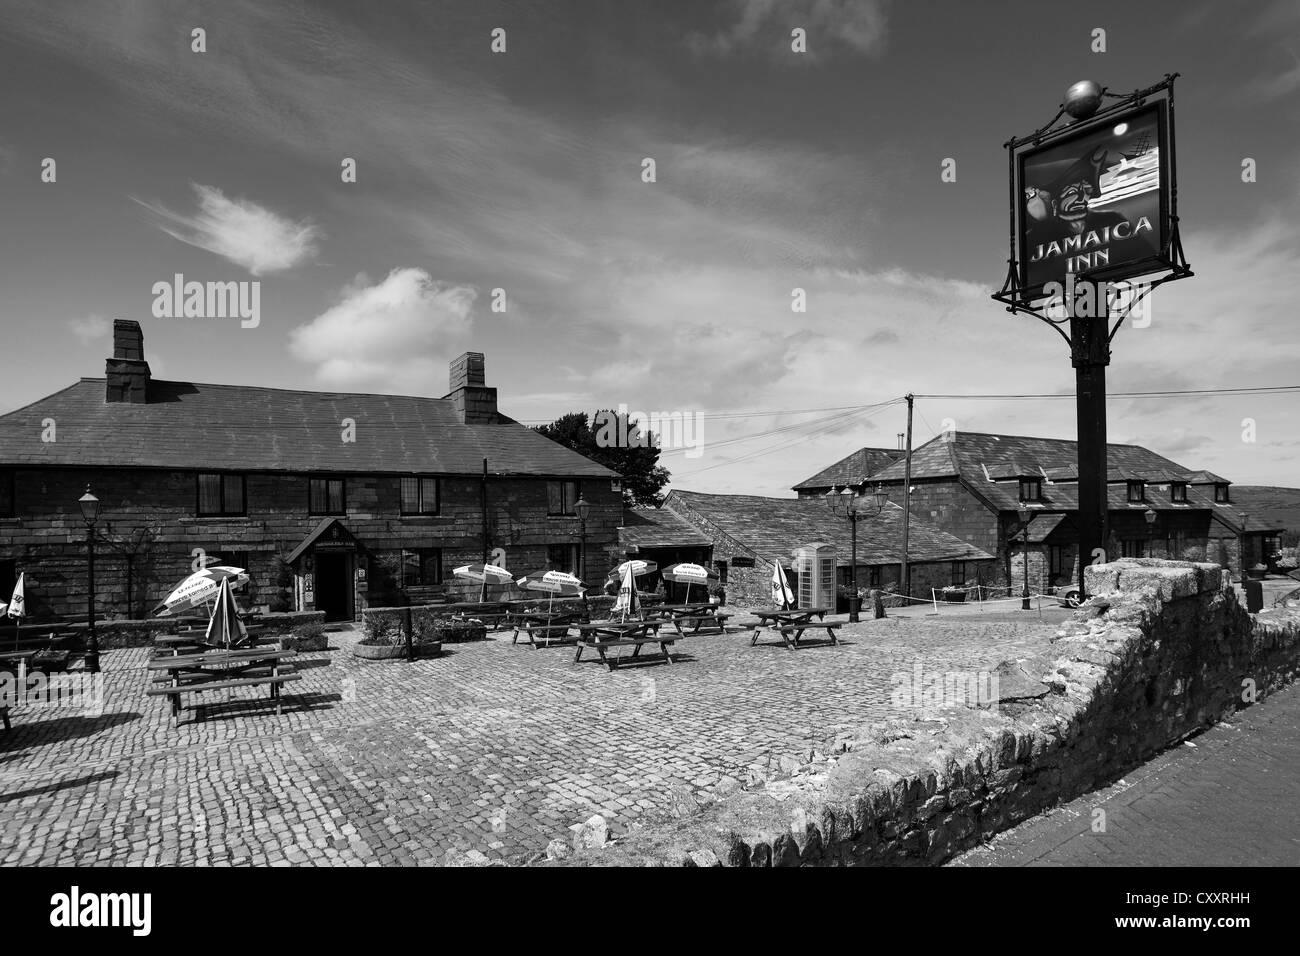 The jamaica inn bodmin moor cornwall england uk stock image